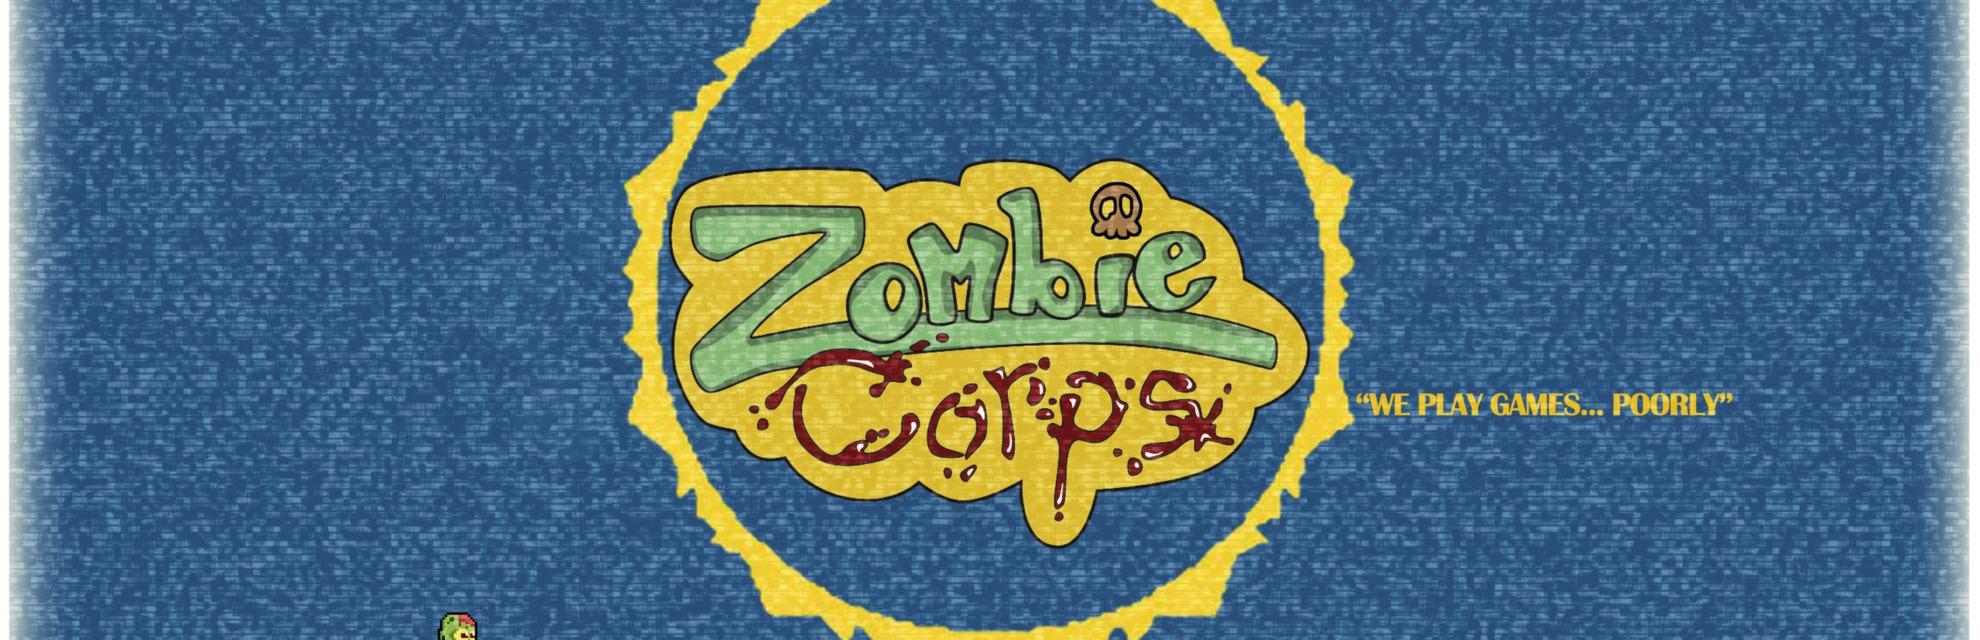 ZombieC0RPS blog header photo